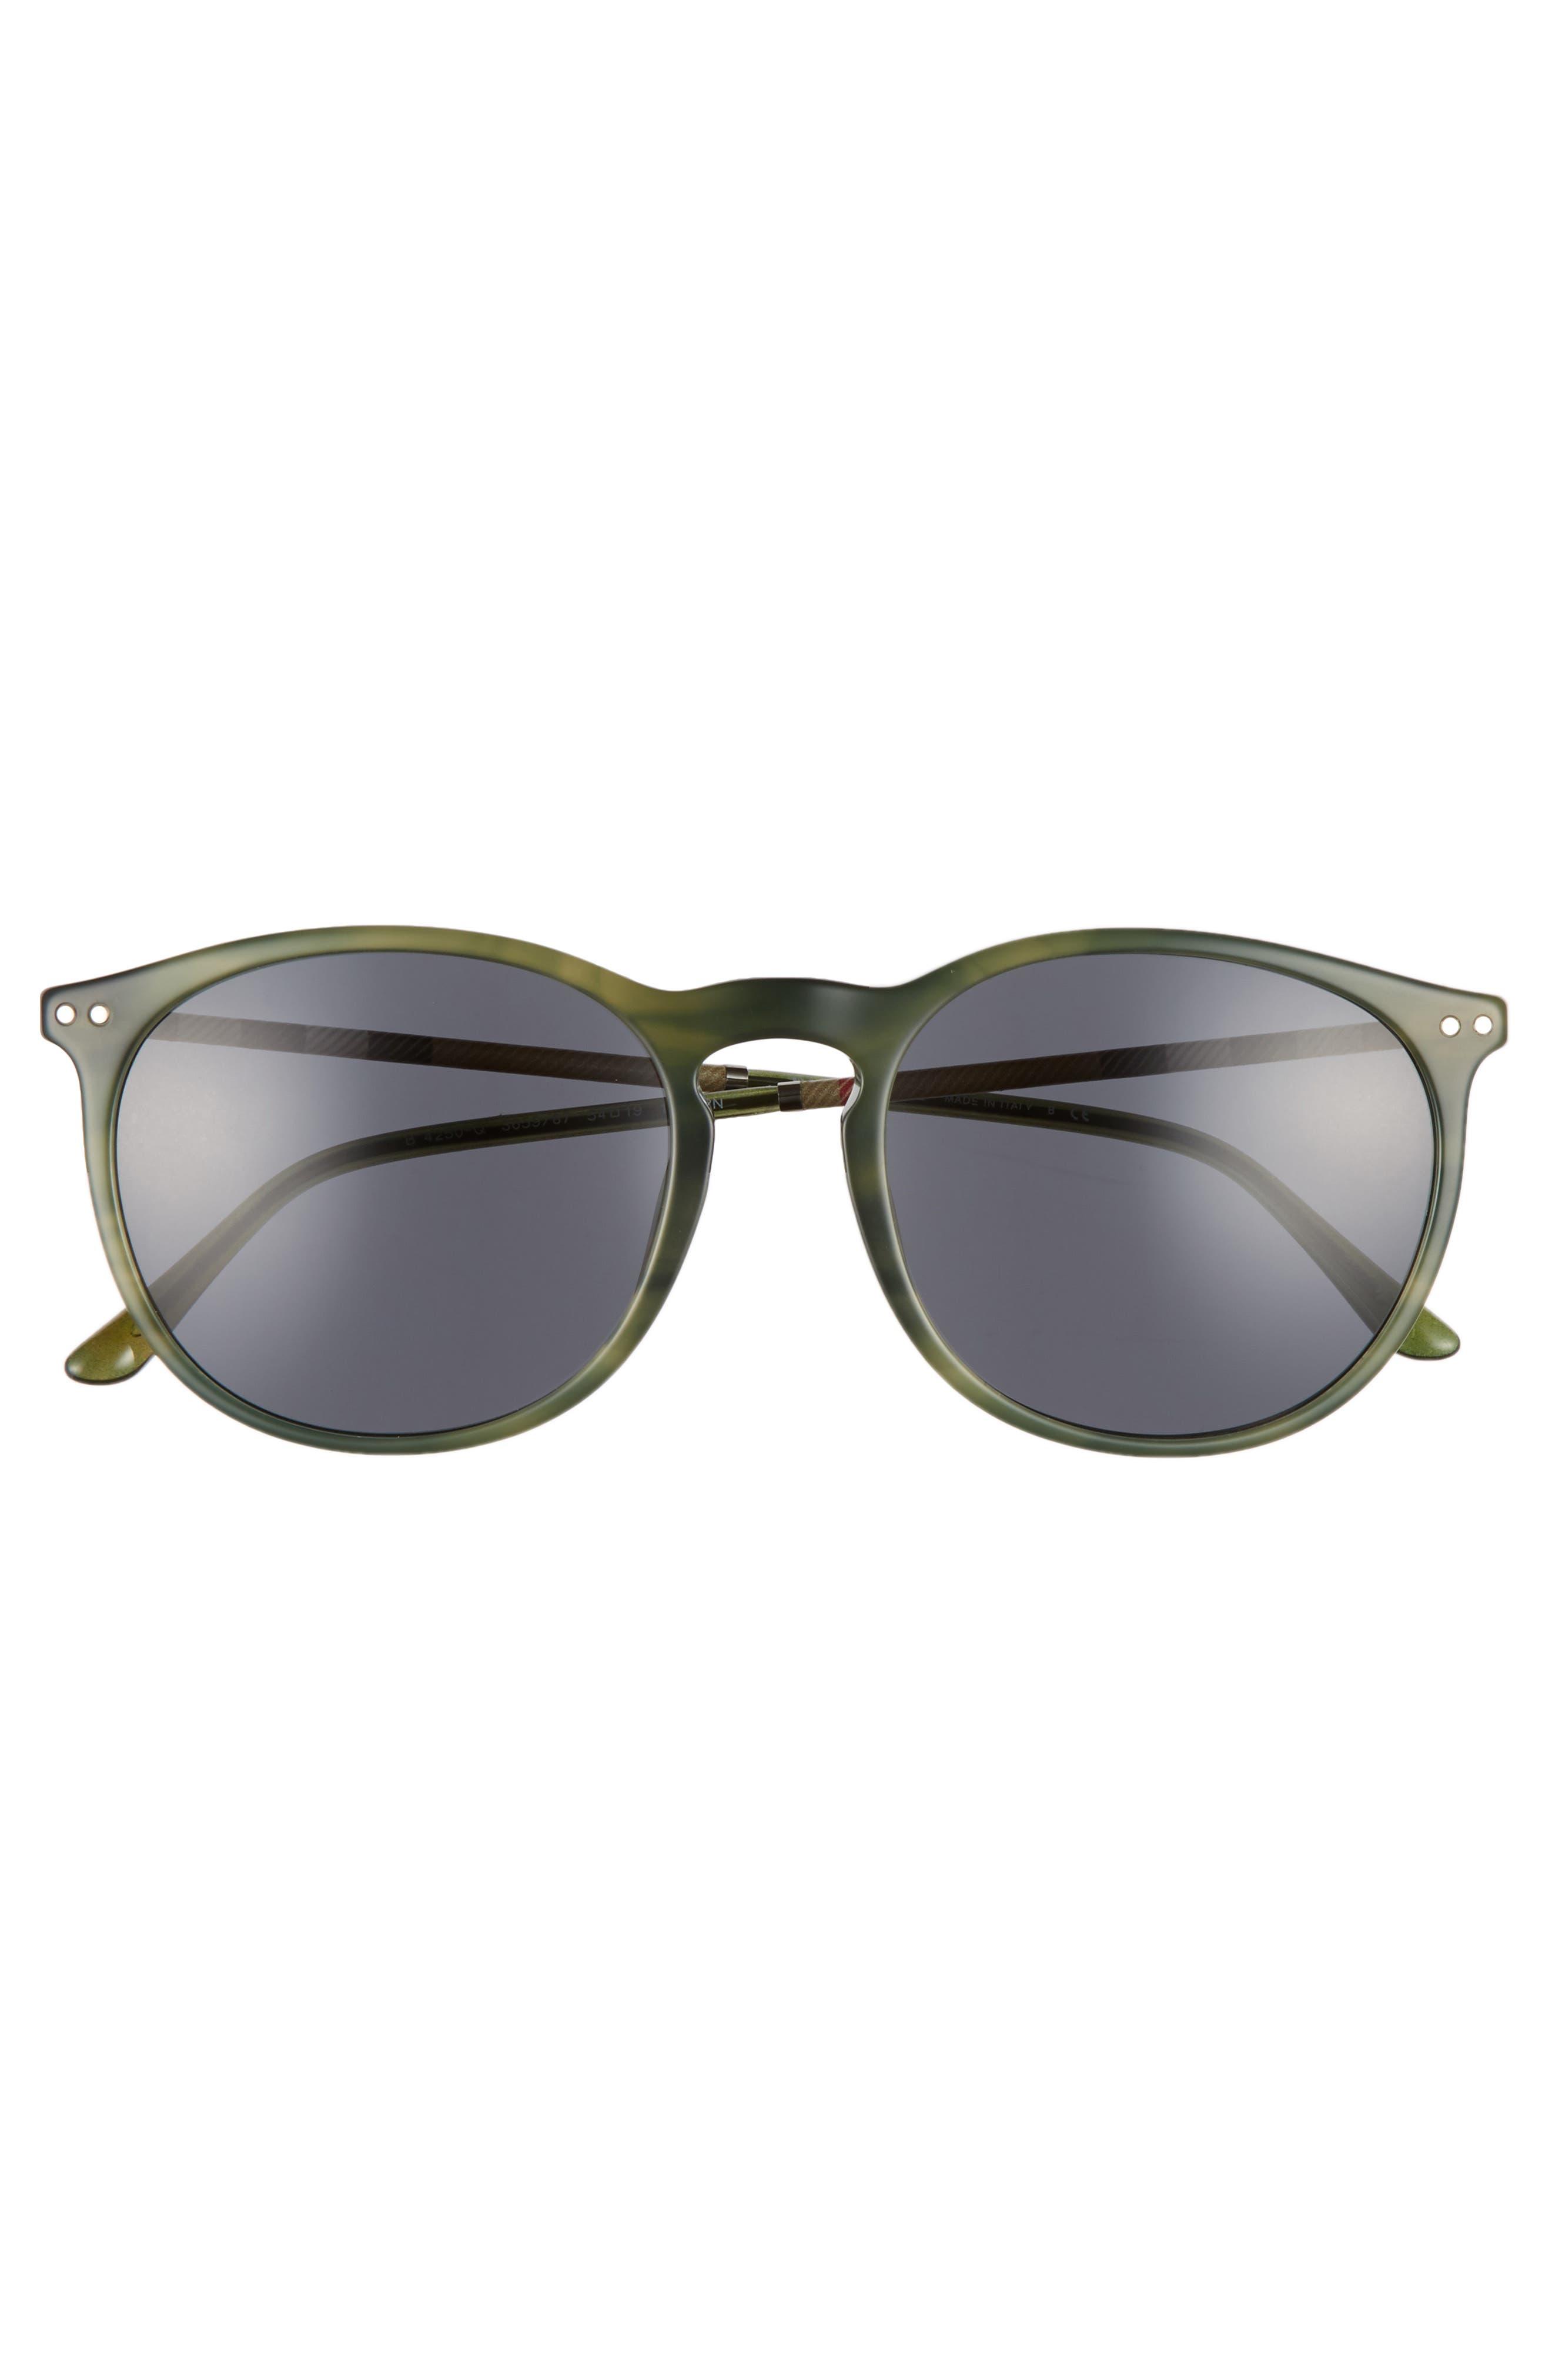 54mm Sunglasses,                             Alternate thumbnail 3, color,                             Grey/ Green